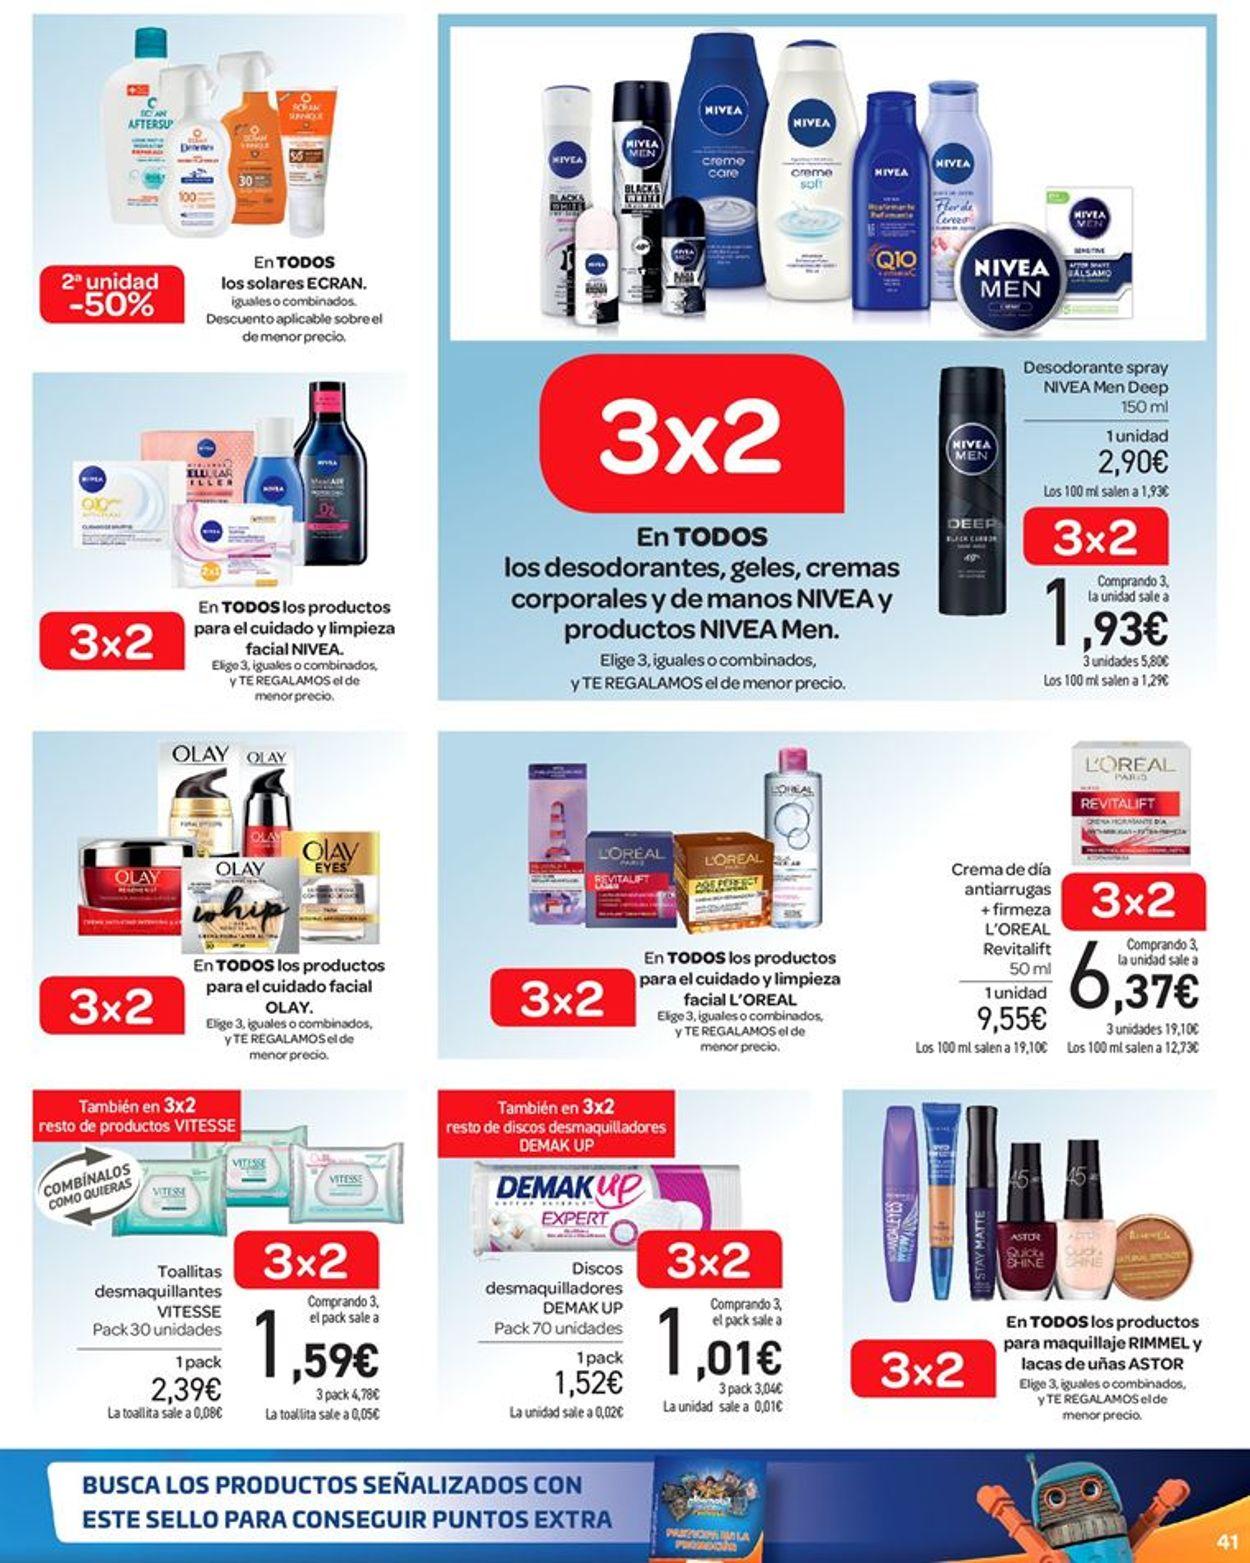 Carrefour Folleto - 23.08-10.09.2019 (Página 41)